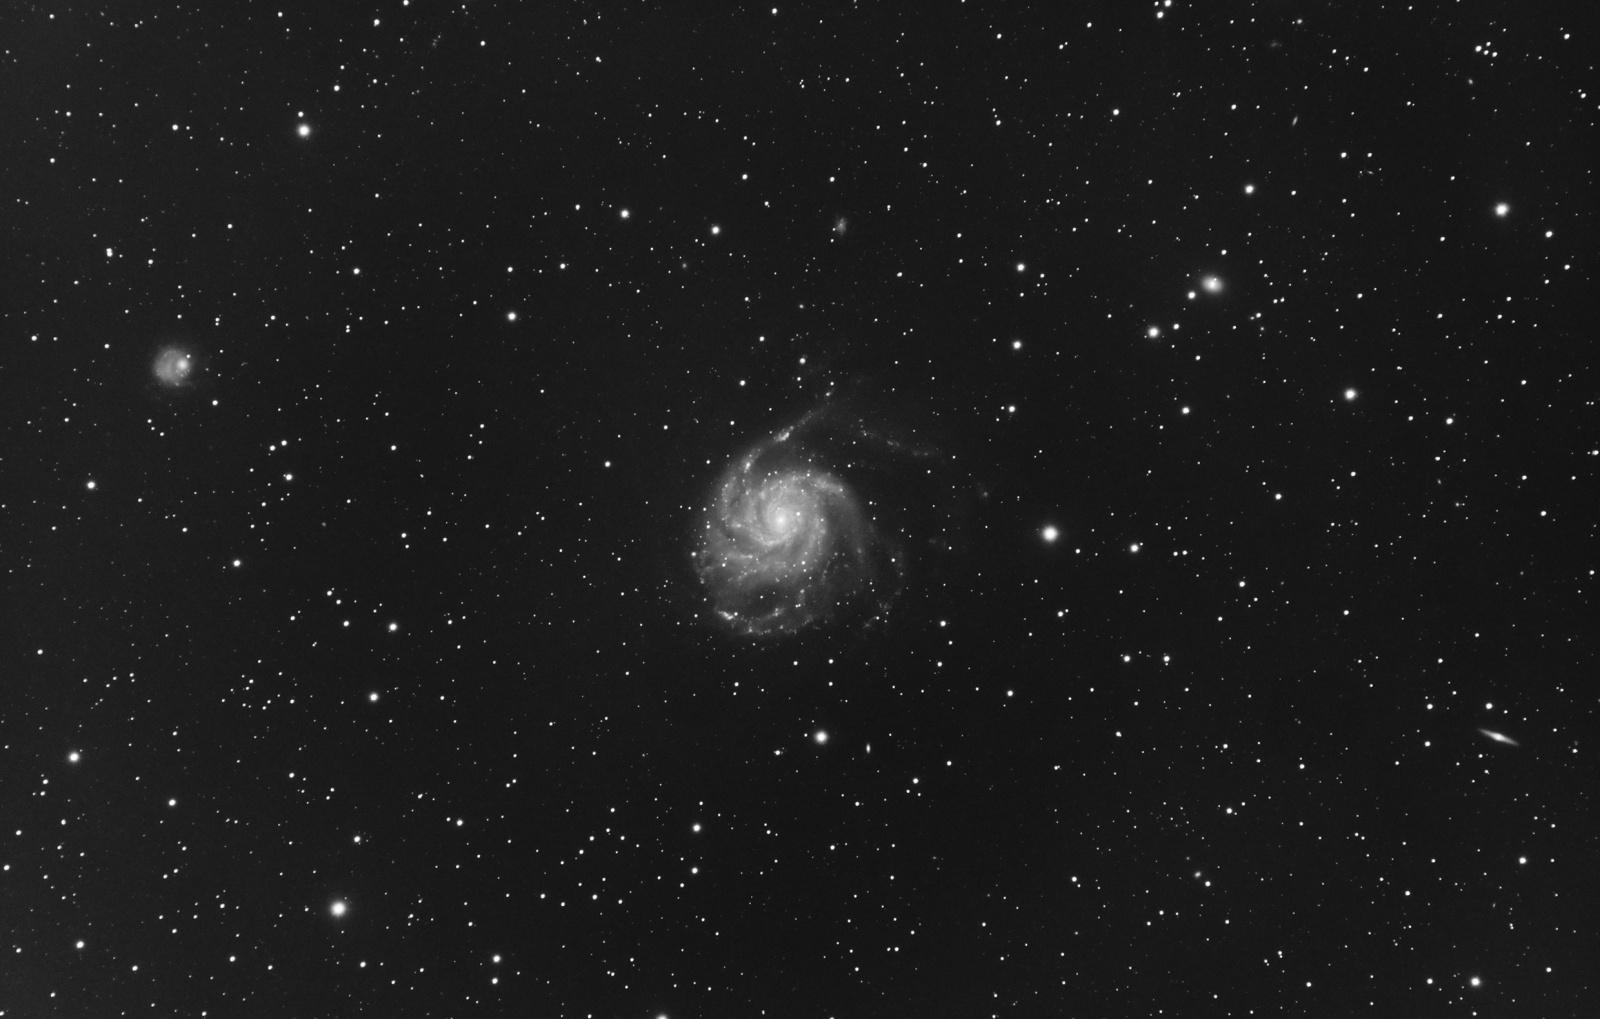 M101_iluminacja.thumb.jpg.05b20014004eb691a058ba1fe68aca68.jpg